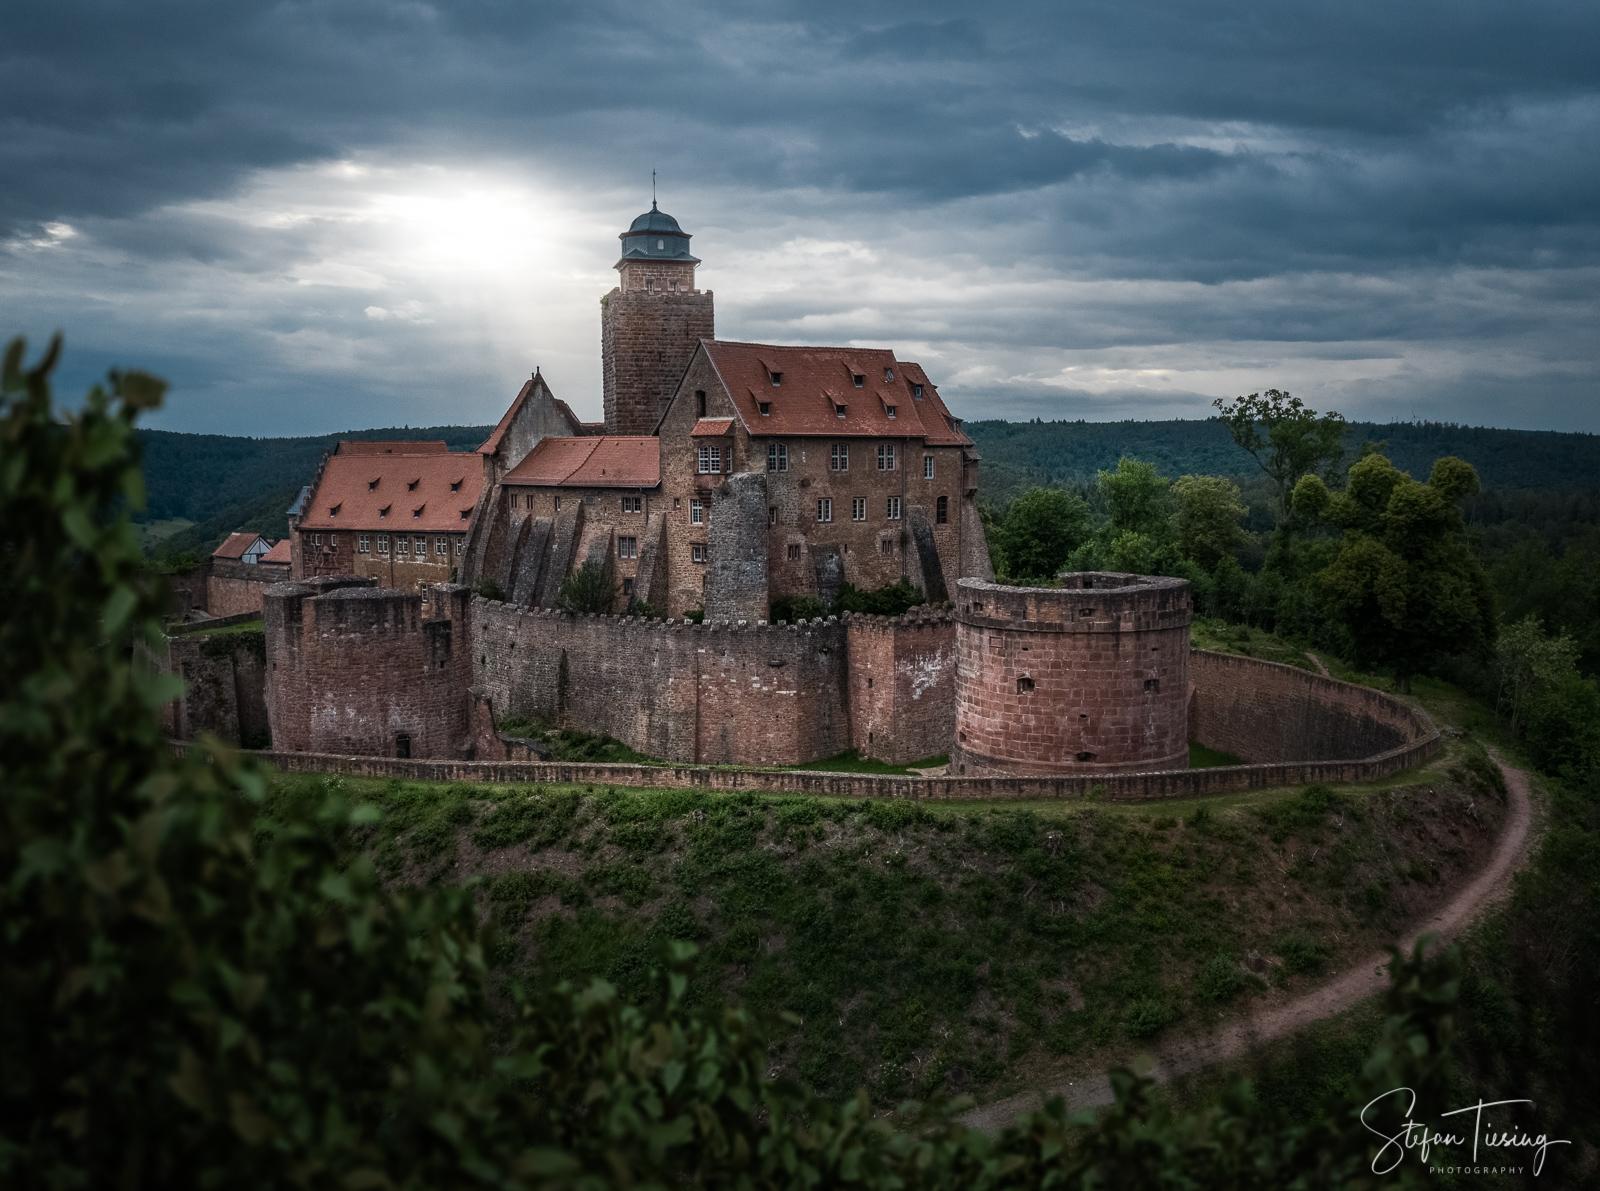 Burg Breuberg - Breuberg Castle, Germany